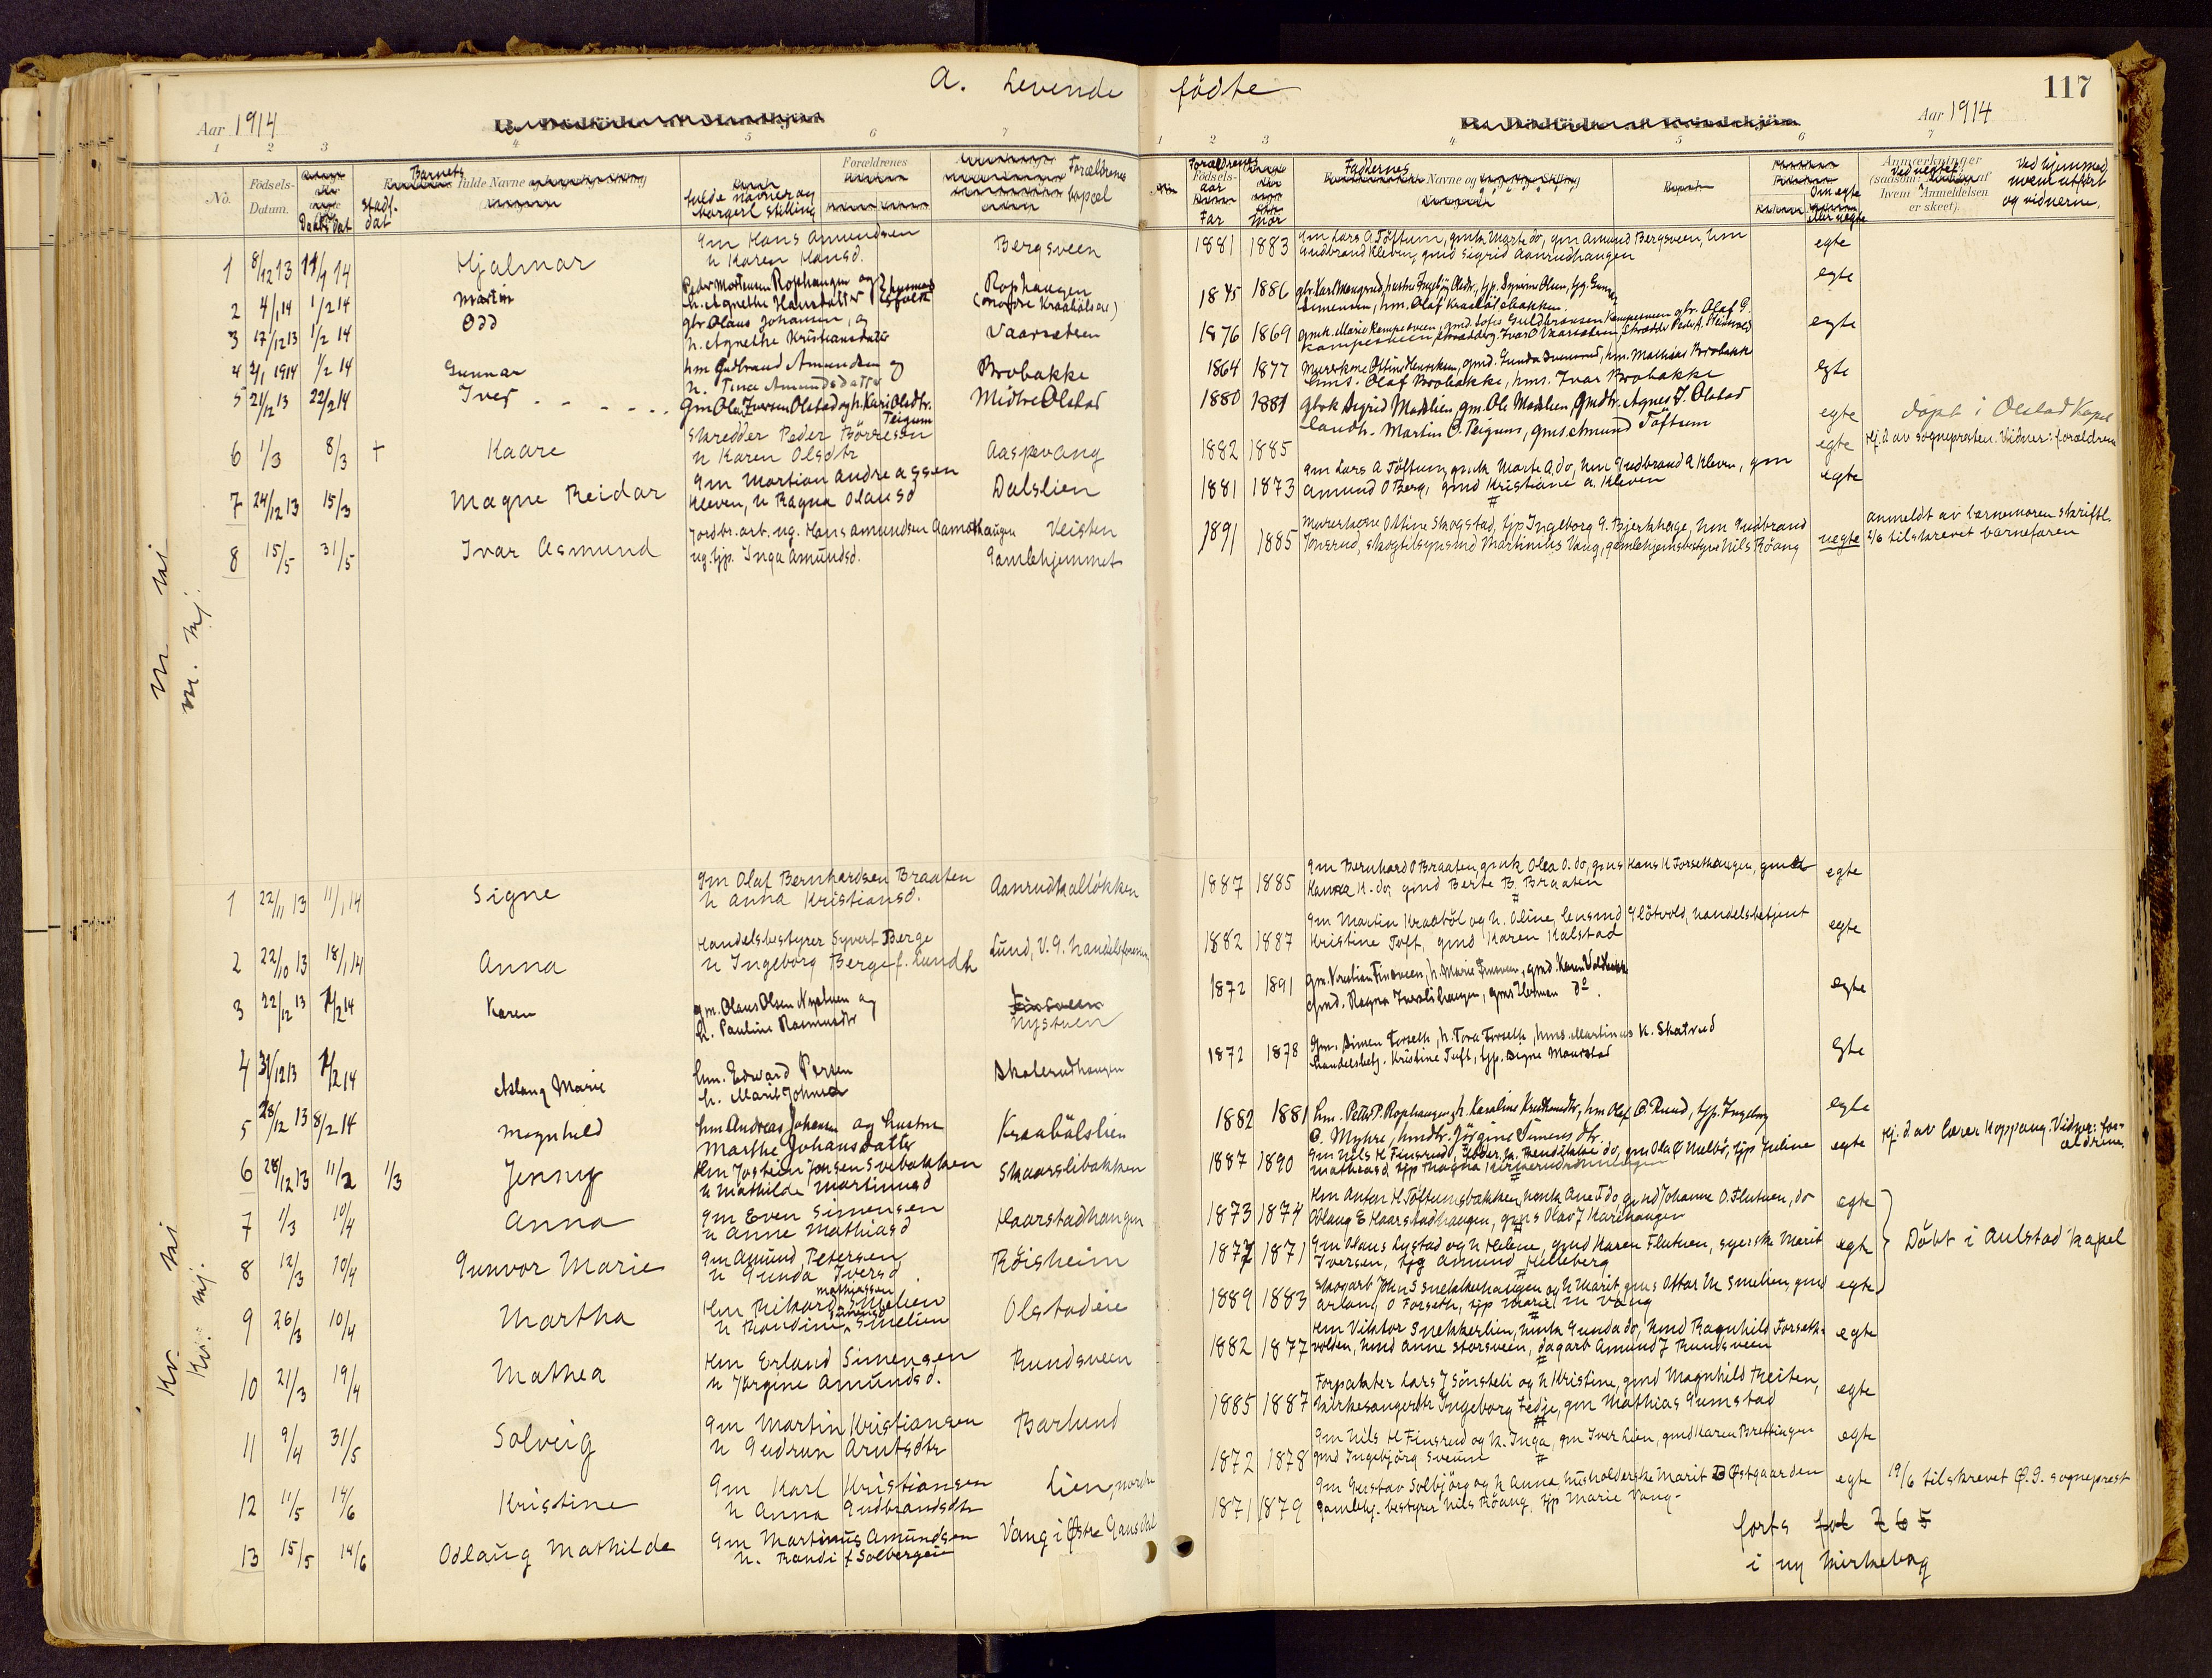 SAH, Vestre Gausdal prestekontor, Ministerialbok nr. 1, 1887-1914, s. 117